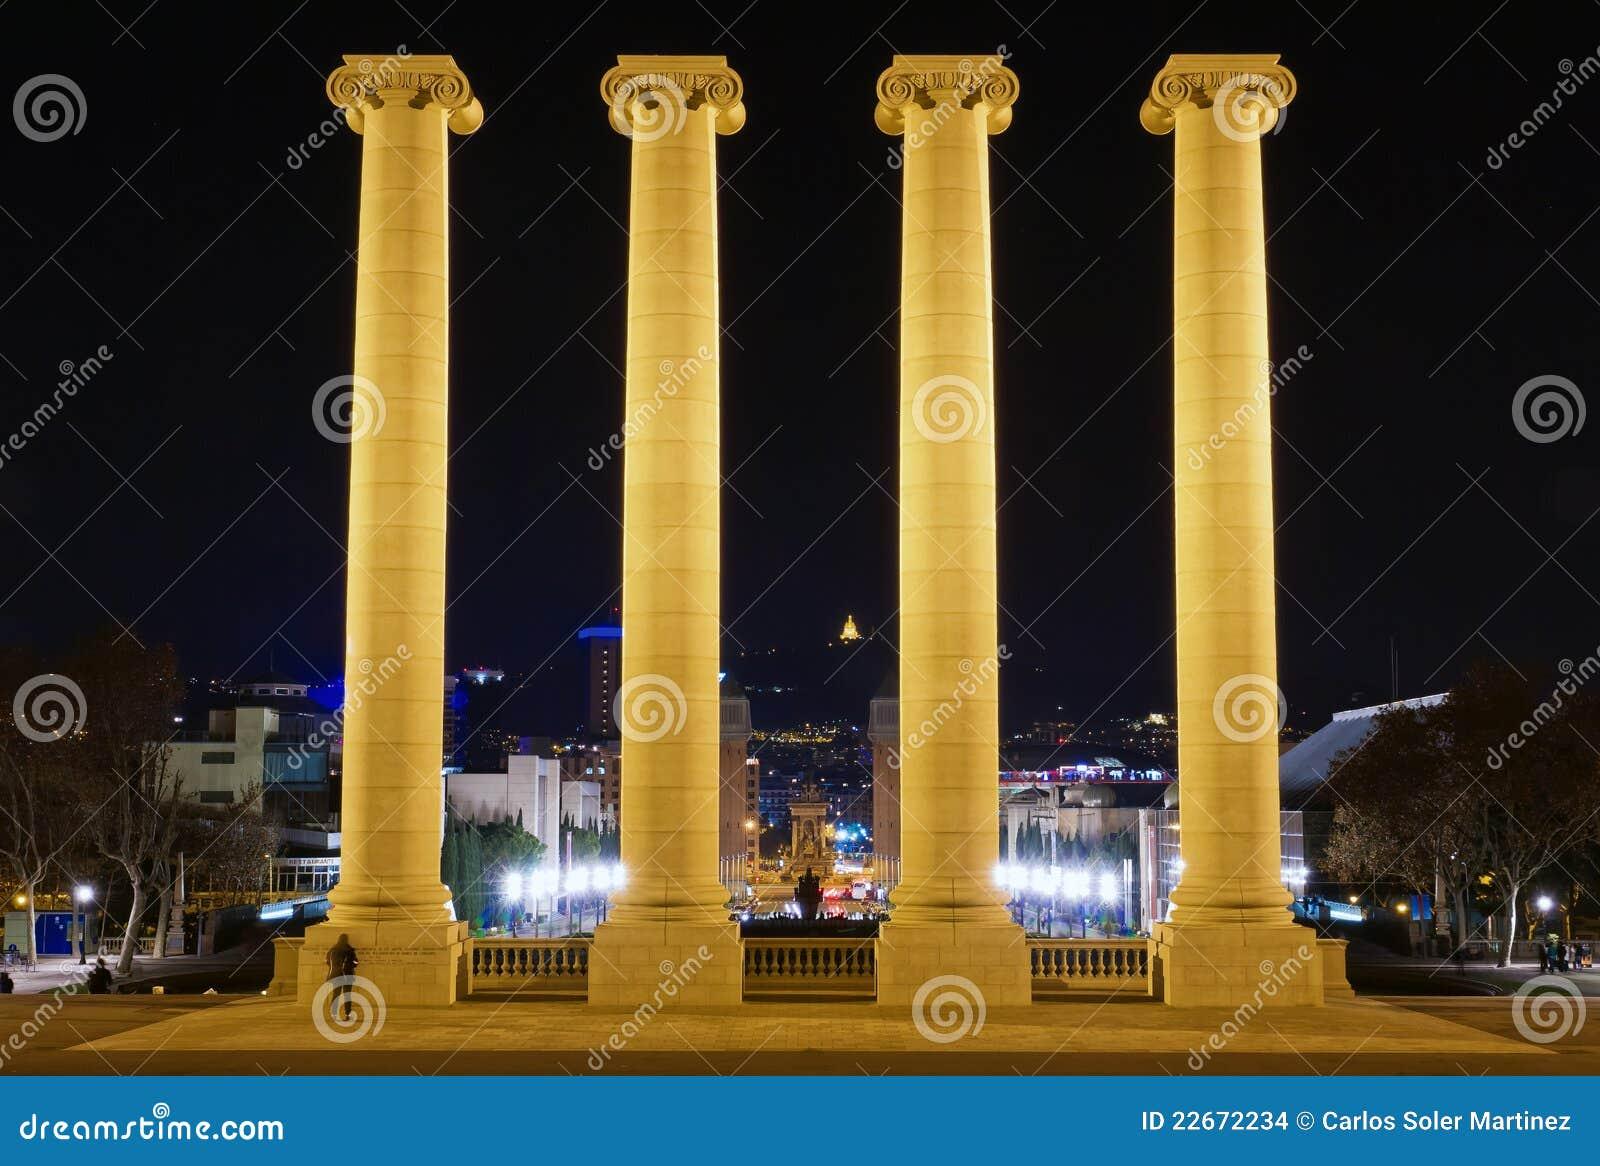 Download Columns On The Placa De Espanya Stock Photo - Image of attraction, landmark: 22672234